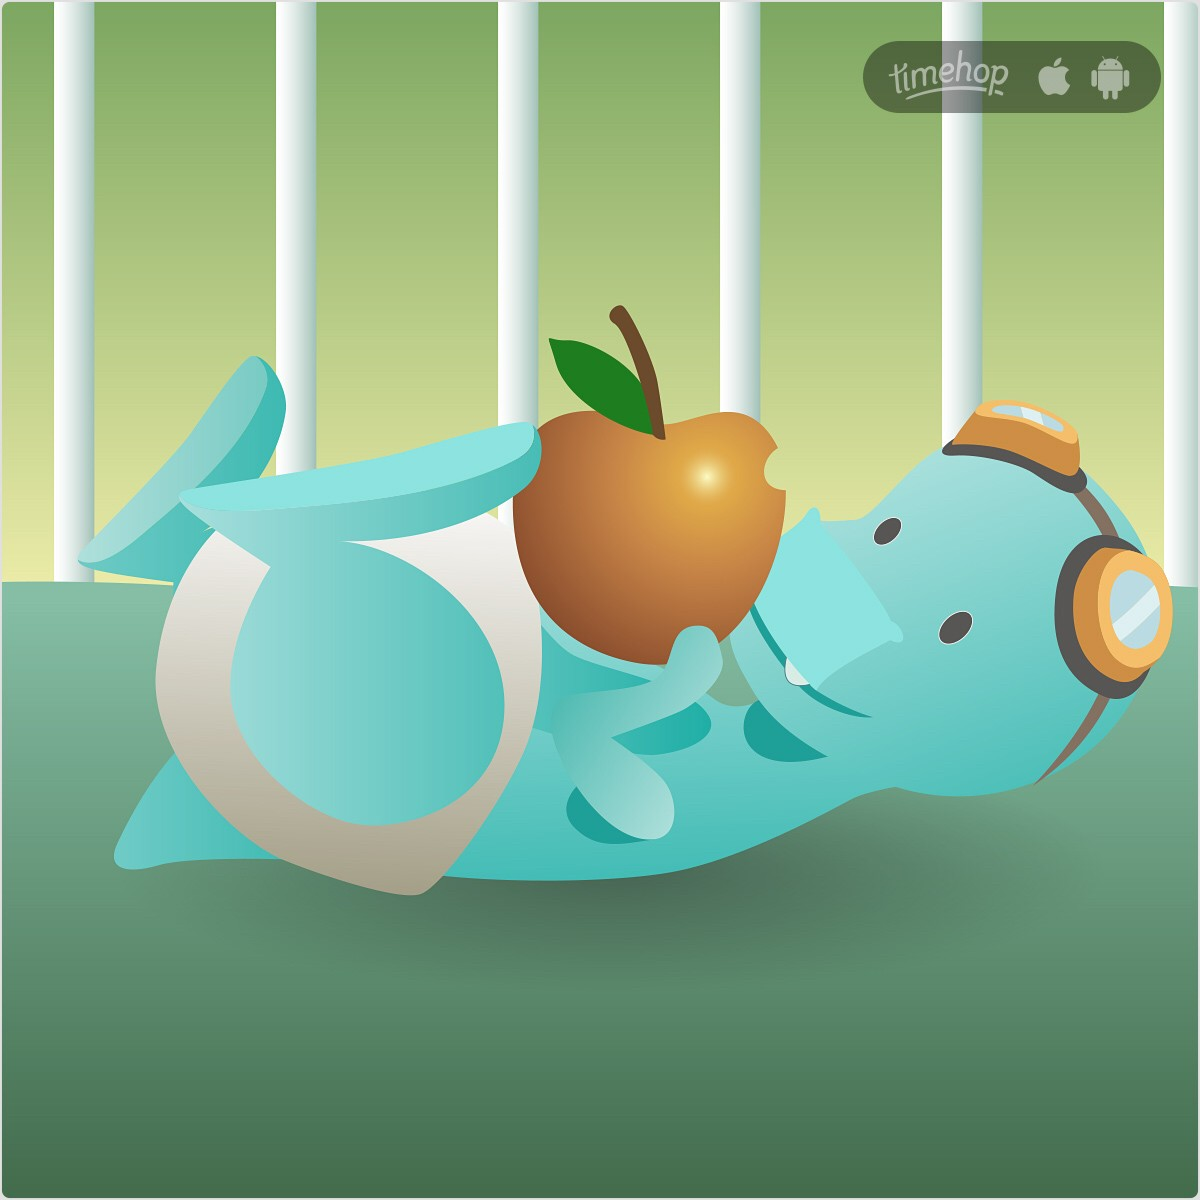 60 years ago founder of Apple, Steve Jobs was born.